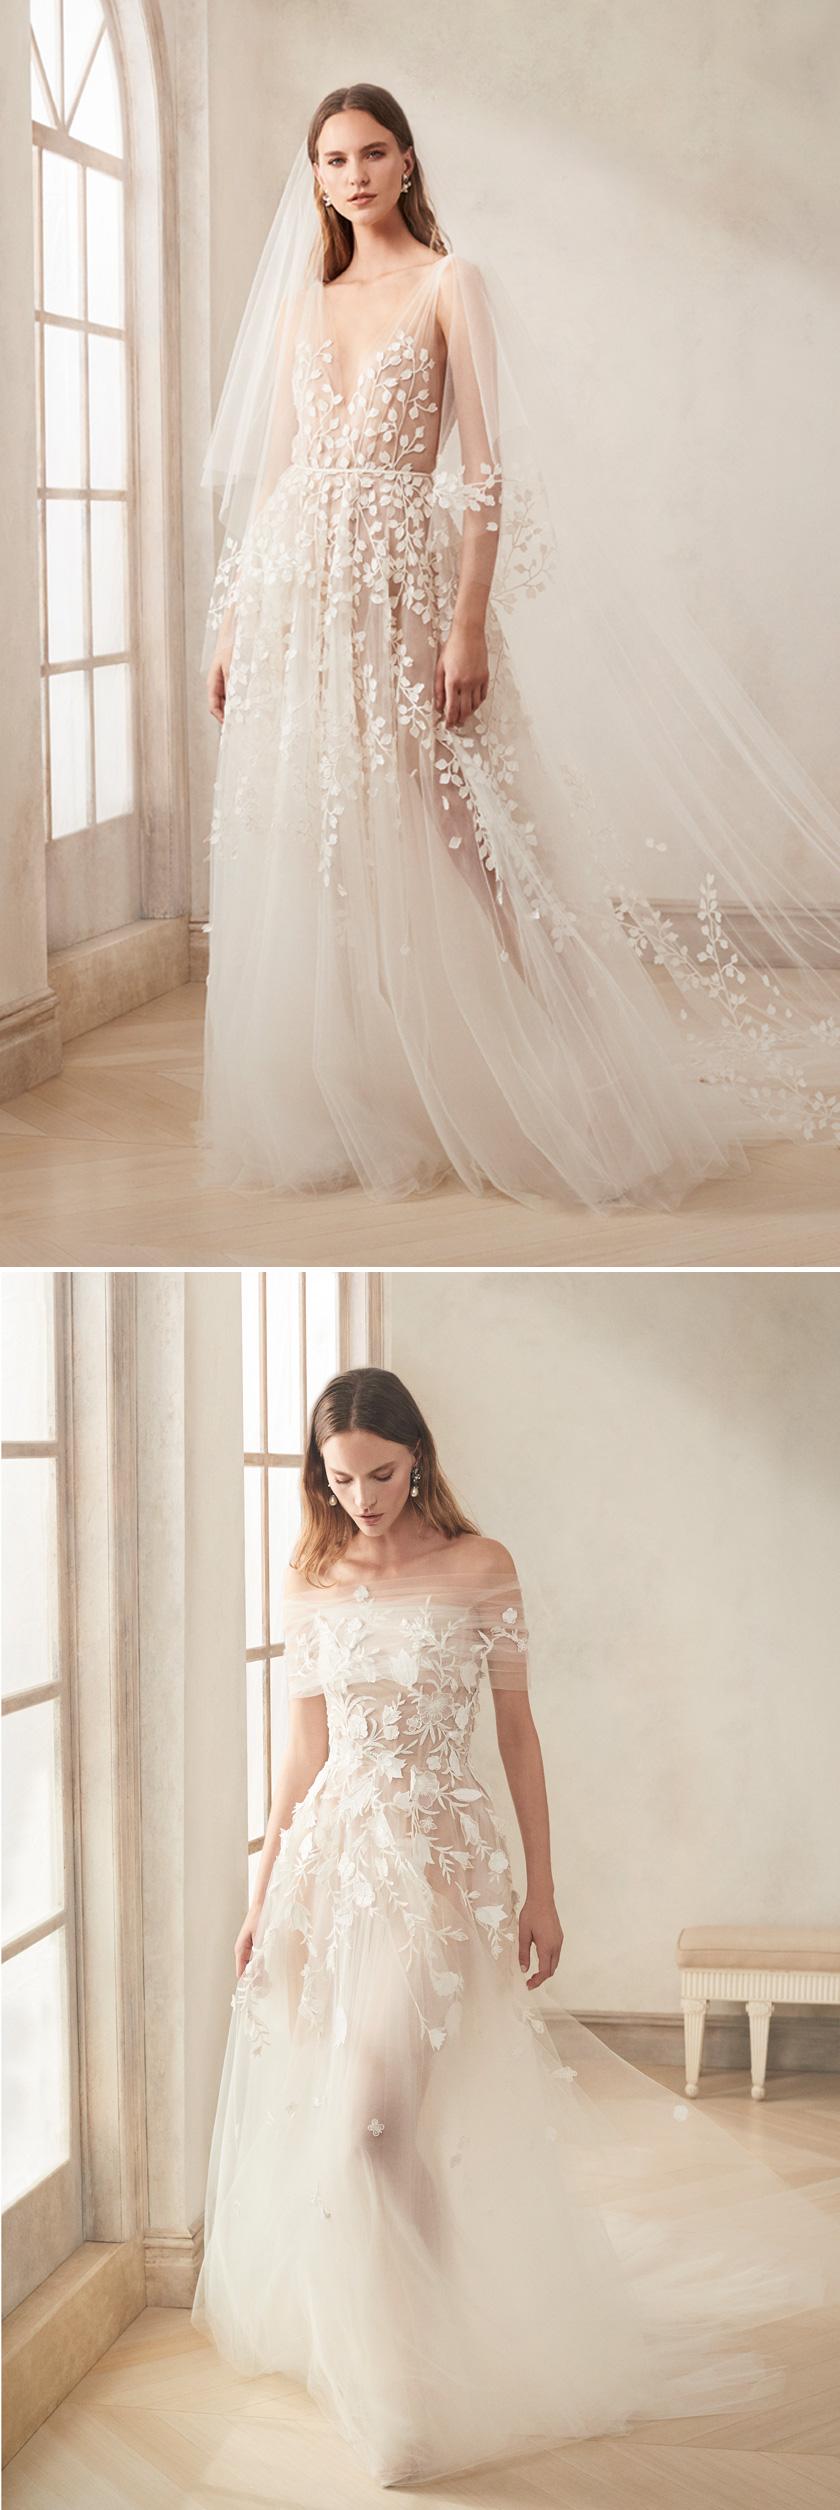 Oscar de la Renta Fall 2020 Bridal collection focuses in the princess silhouette Perfect Wedding Magazine